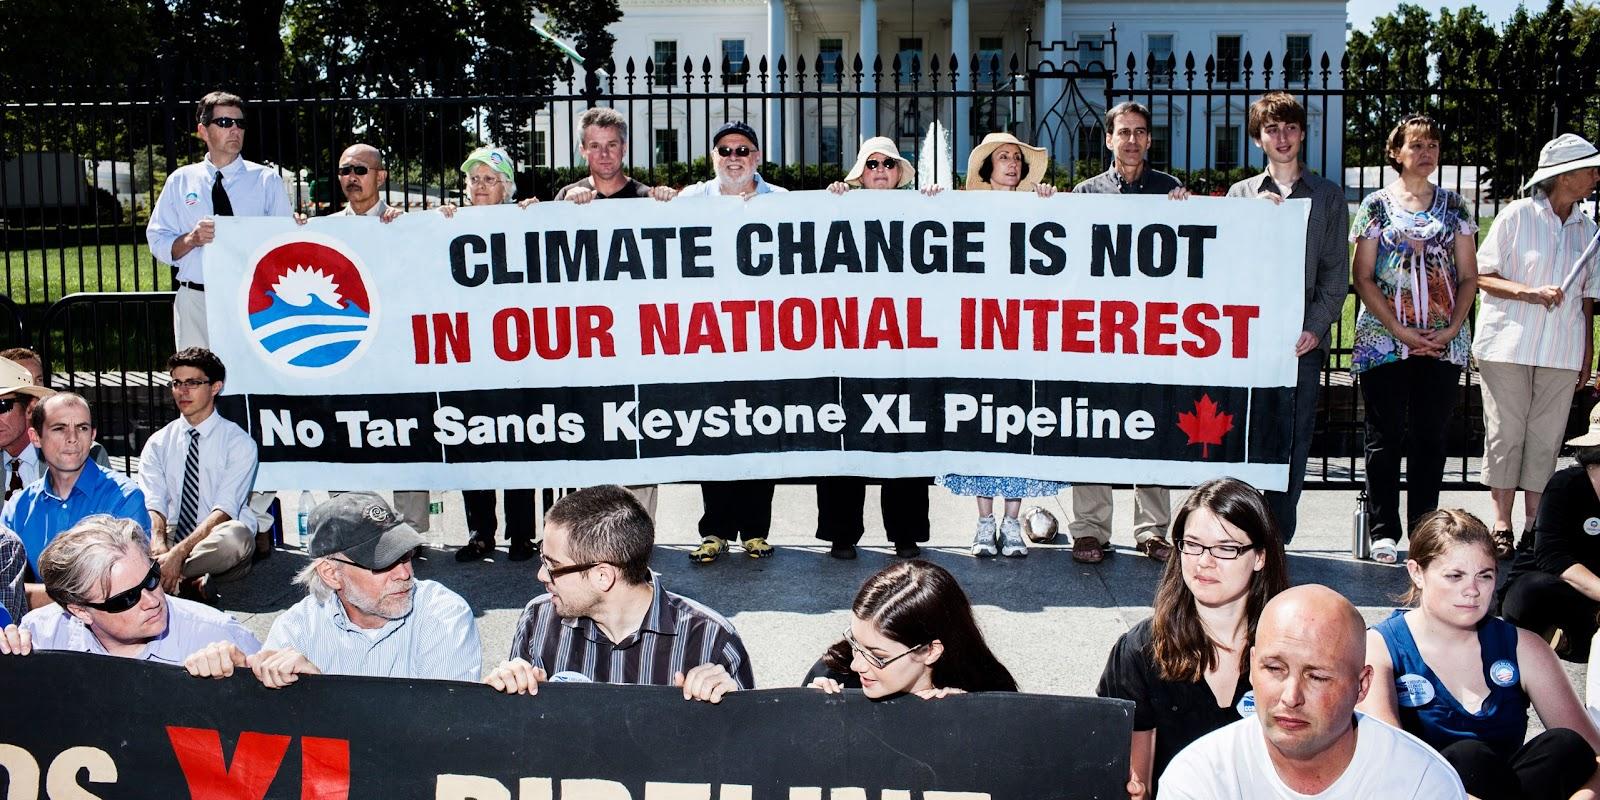 NO Tar Sand Keystone XL Pipeline